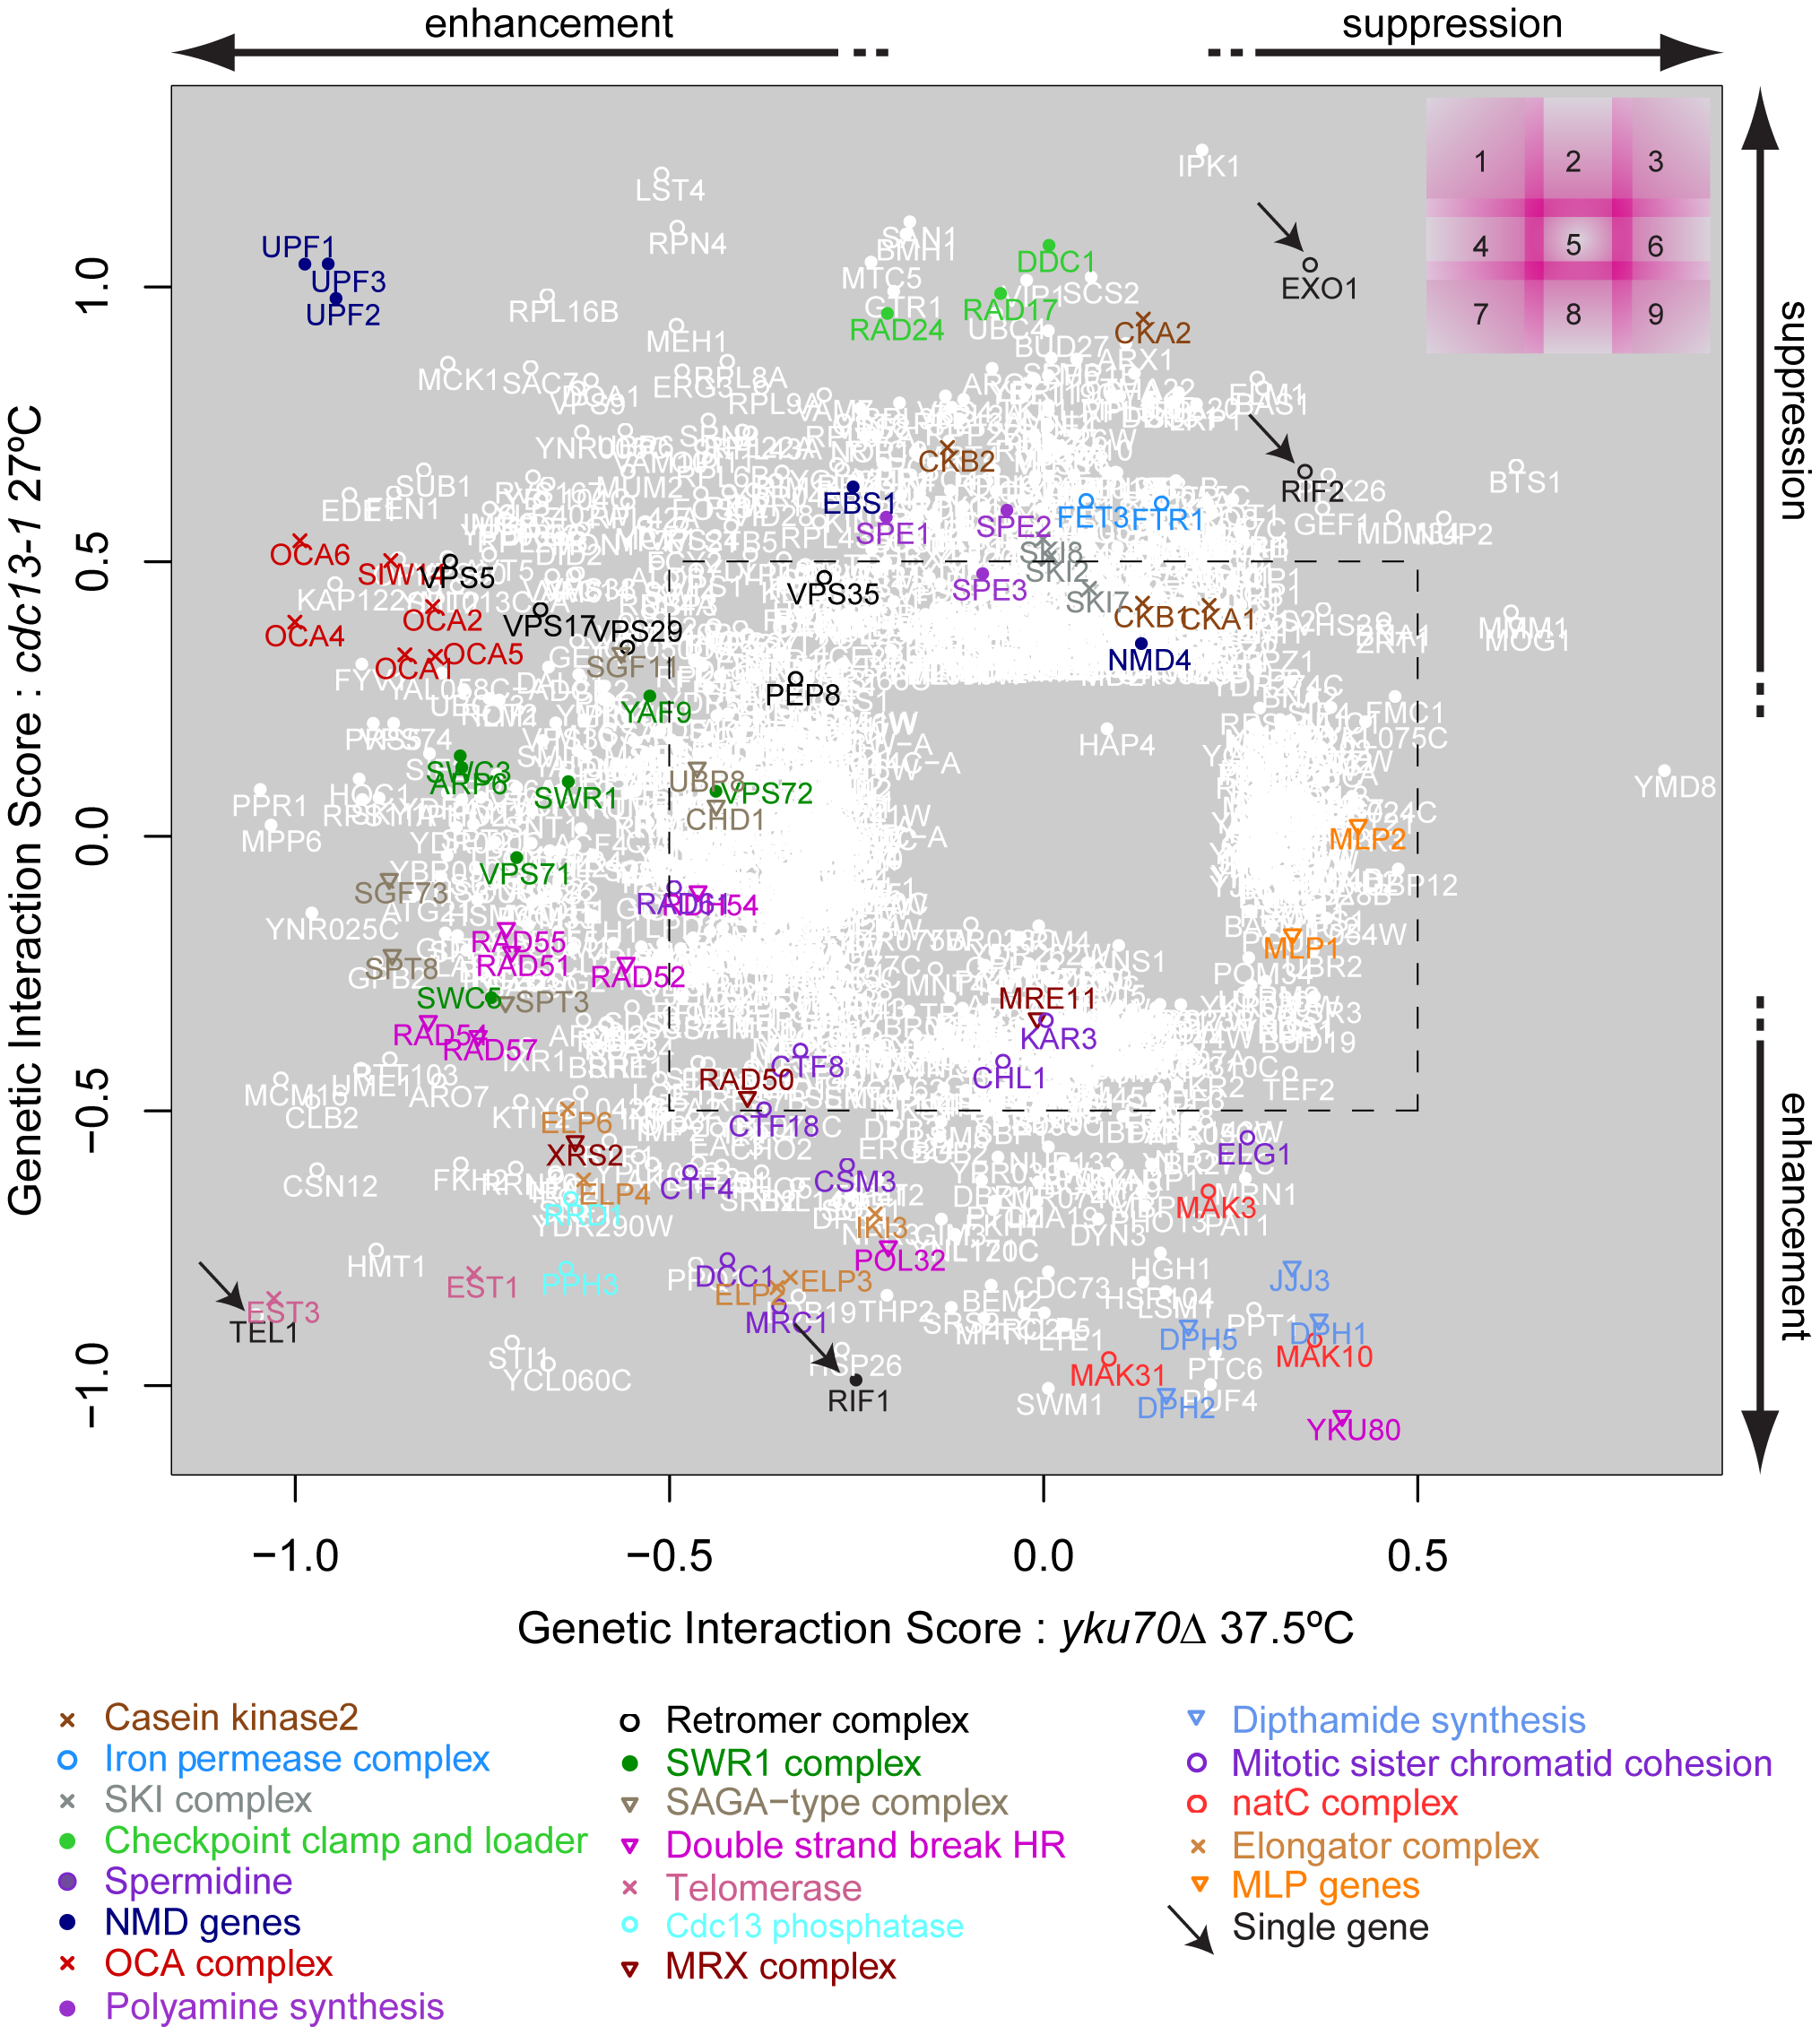 Genetic interaction strength (GIS) comparison between <i>cdc13-1</i> and <i>yku70</i>Δ.